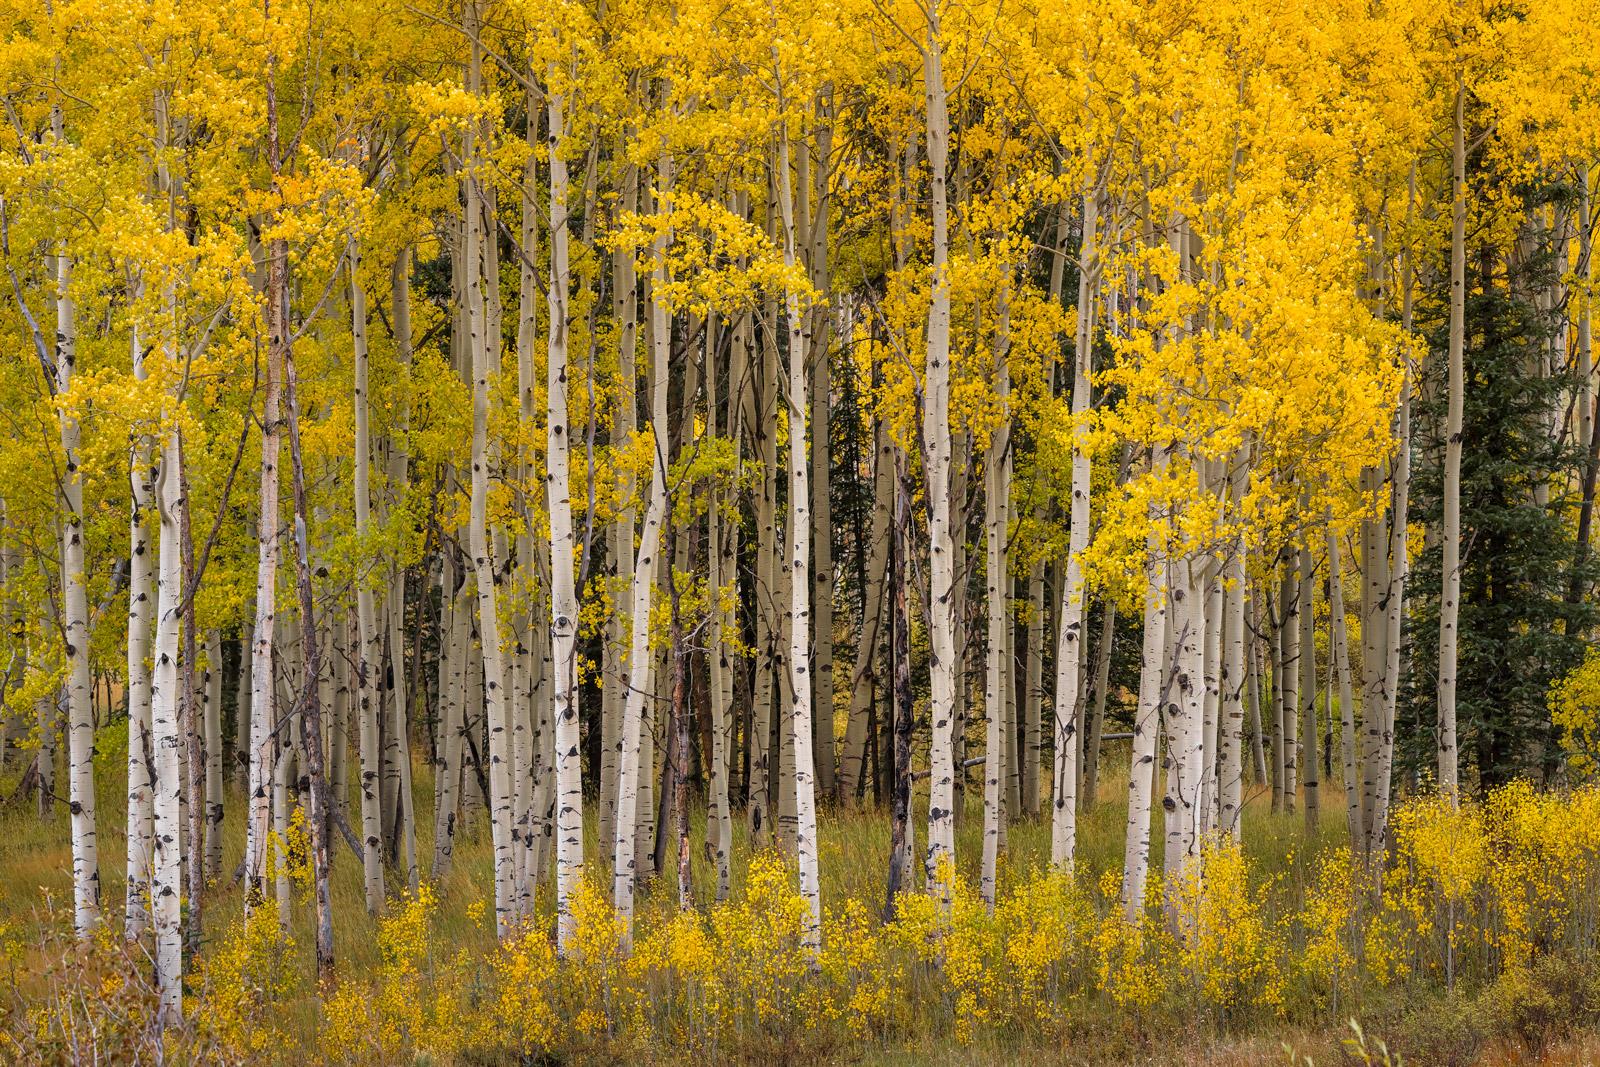 Colorado, Aspen, Trees, Fall, Color, limited edition, photograph, southwest colorado, fine art, landscape, fall color, photo